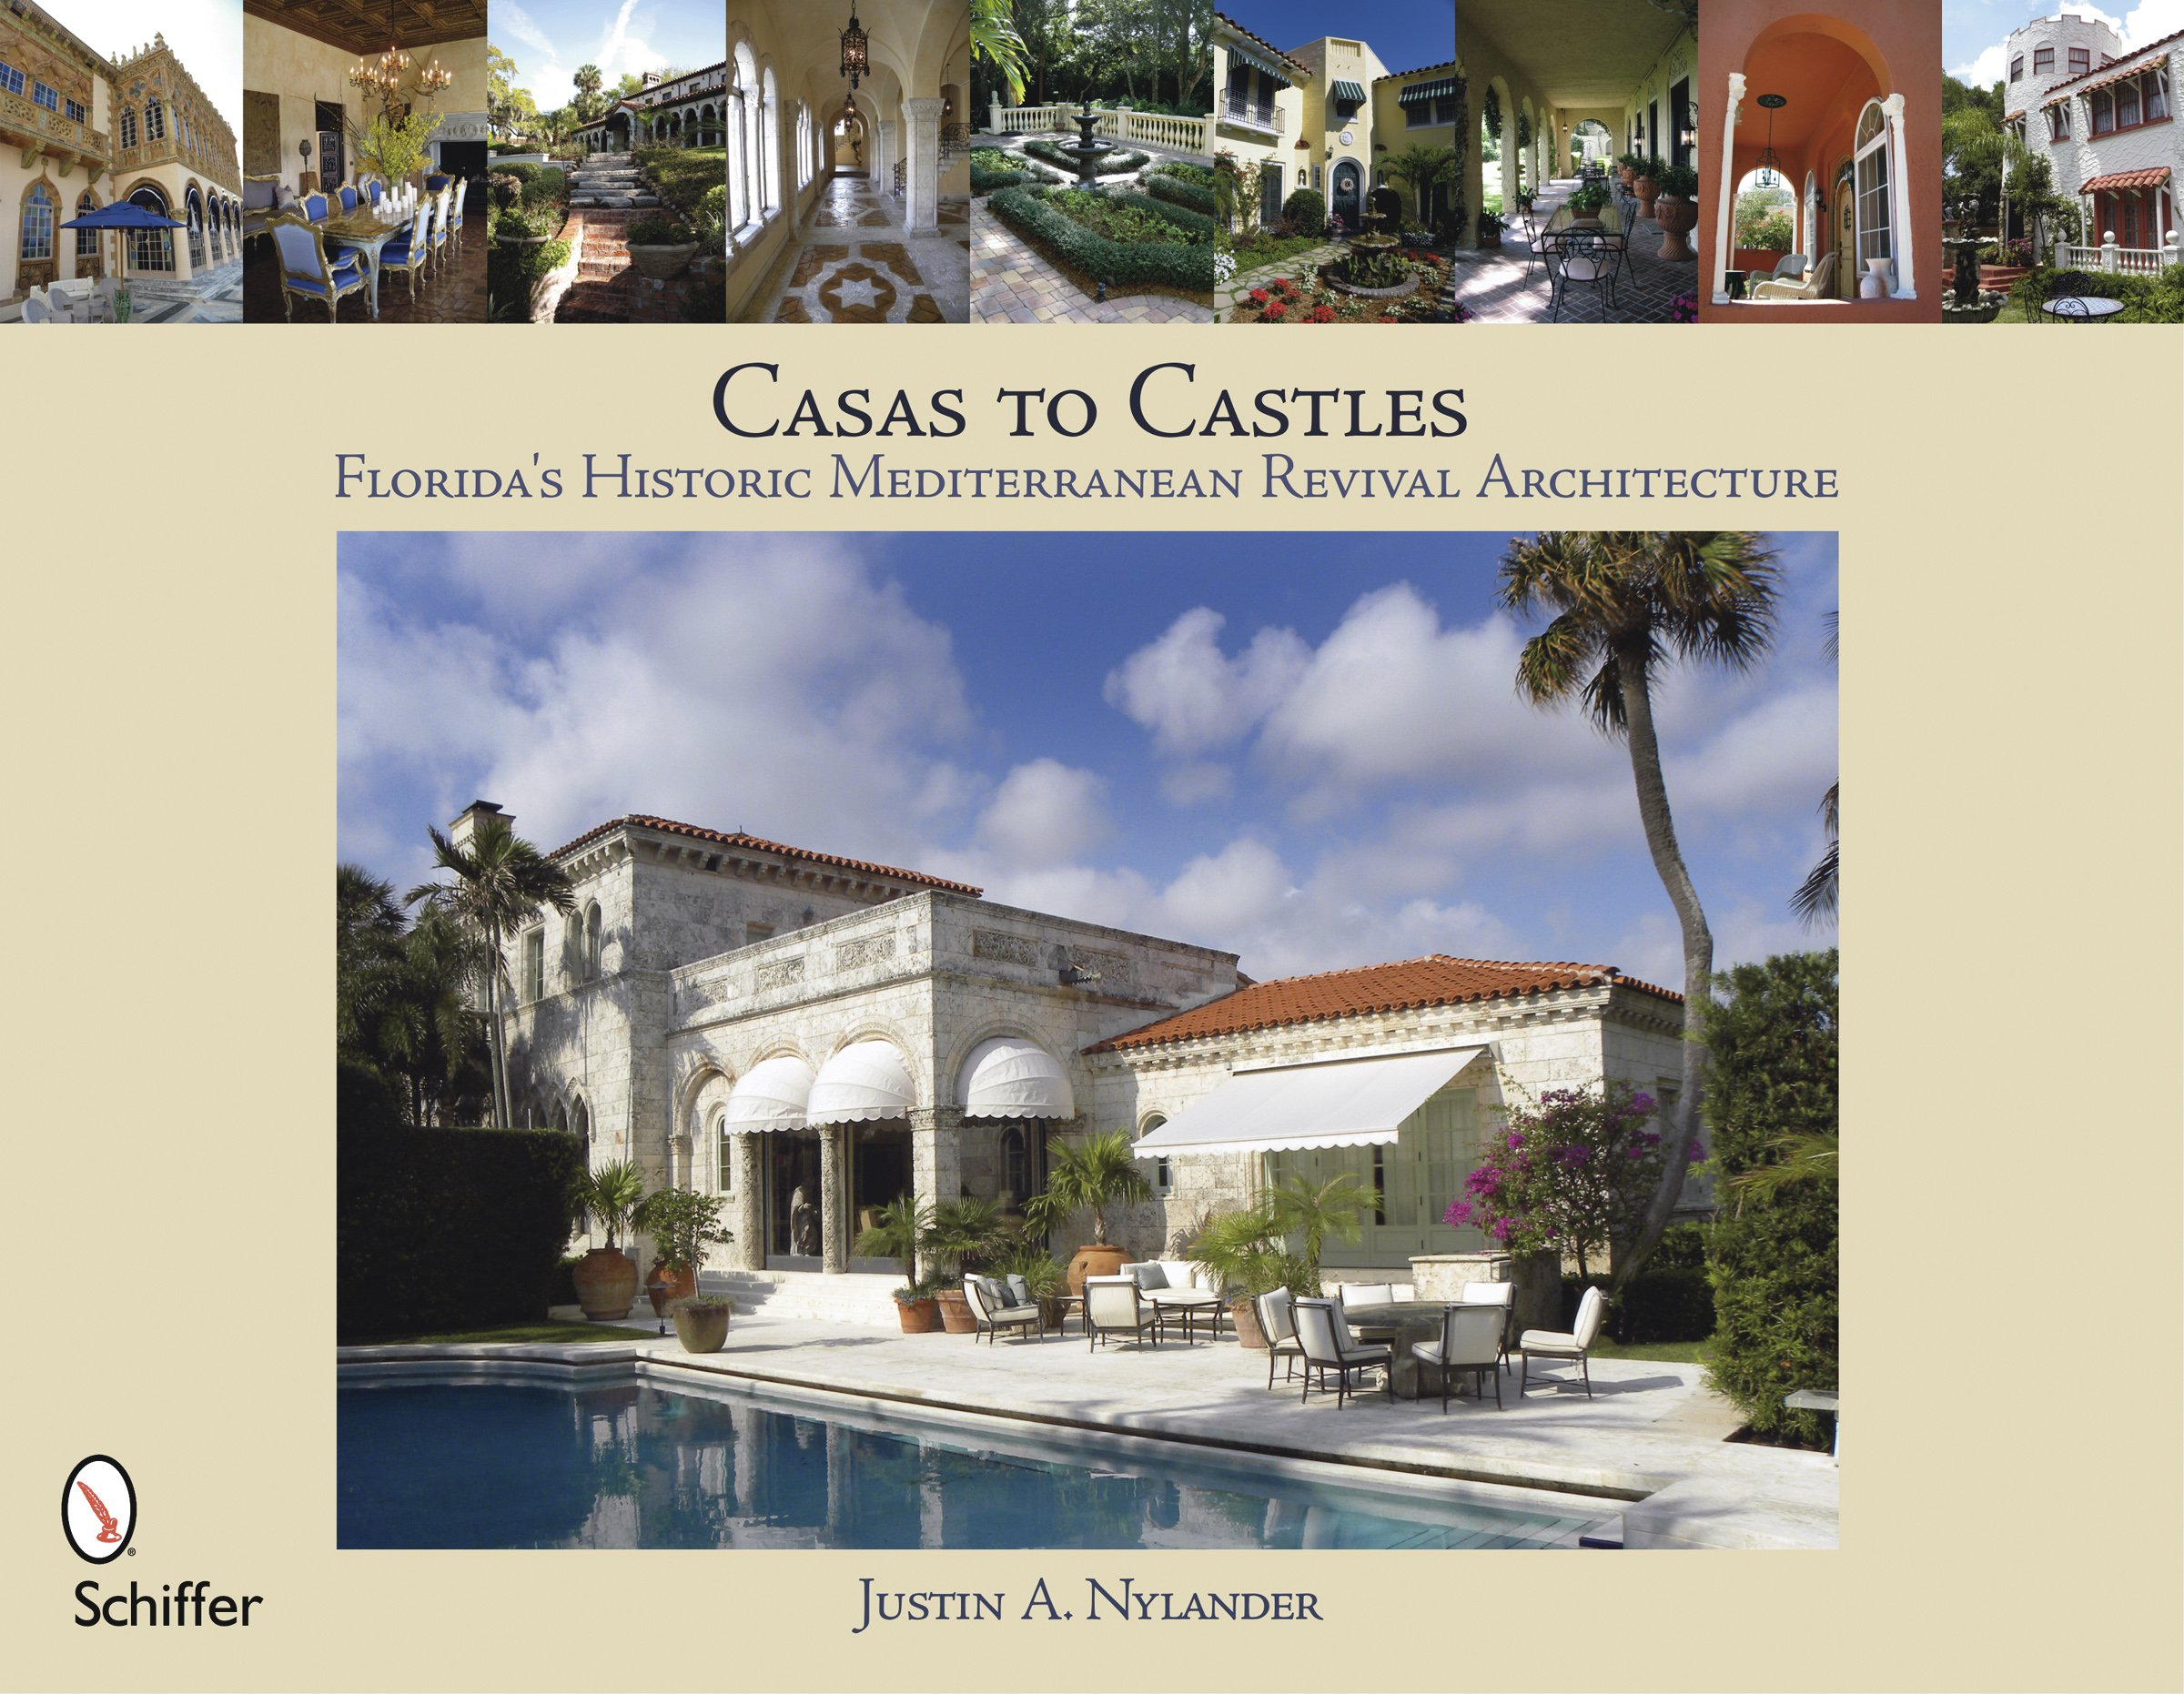 Casas Castles Floridas Mediterranean Architecture product image